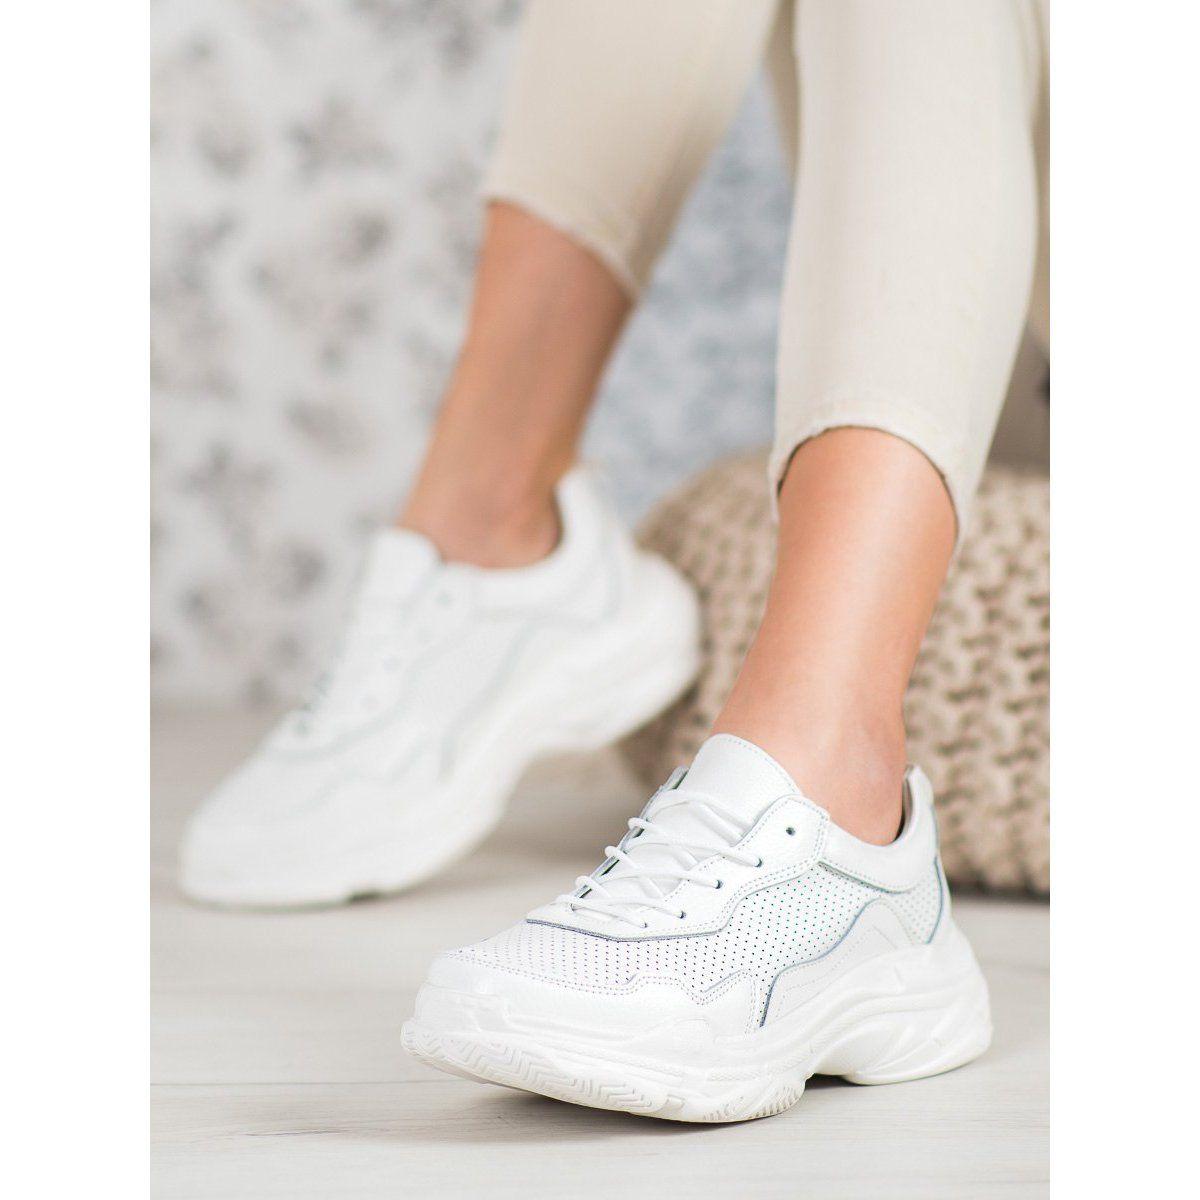 Goodin Biale Skorzane Sneakersy White Sneaker Shoes Adidas Stan Smith